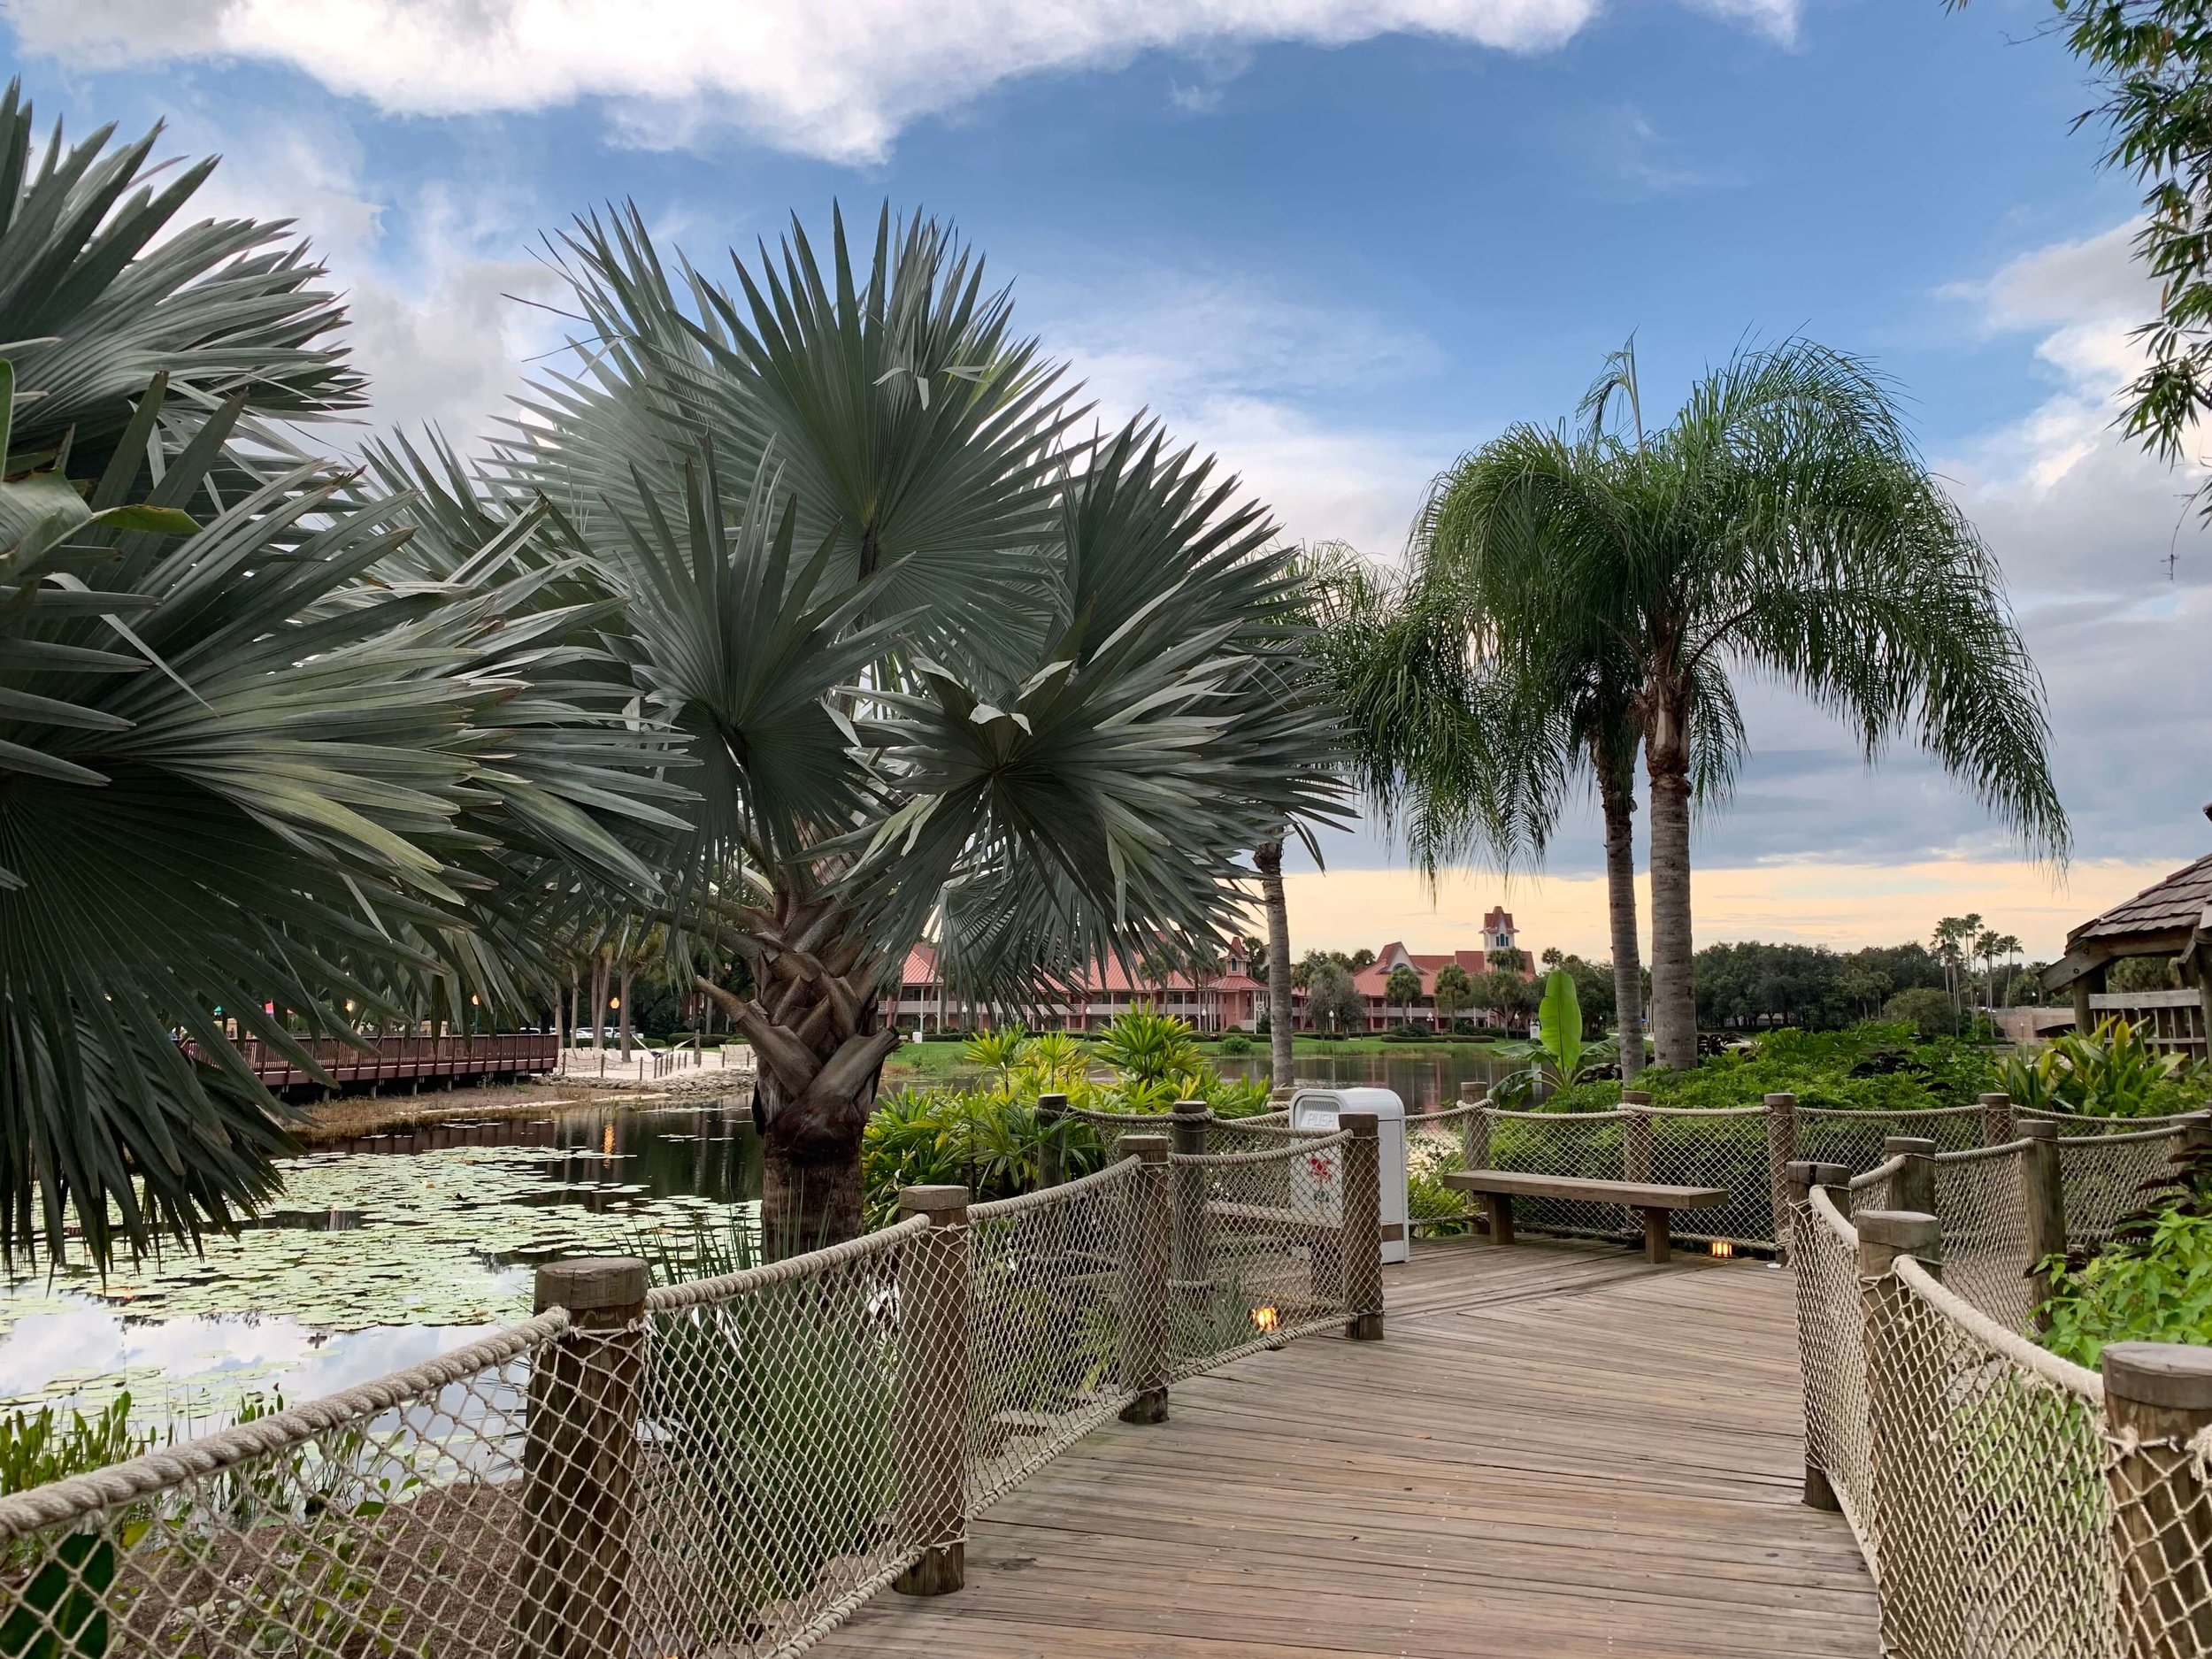 Disney's Caribbean Beach Resort walkway